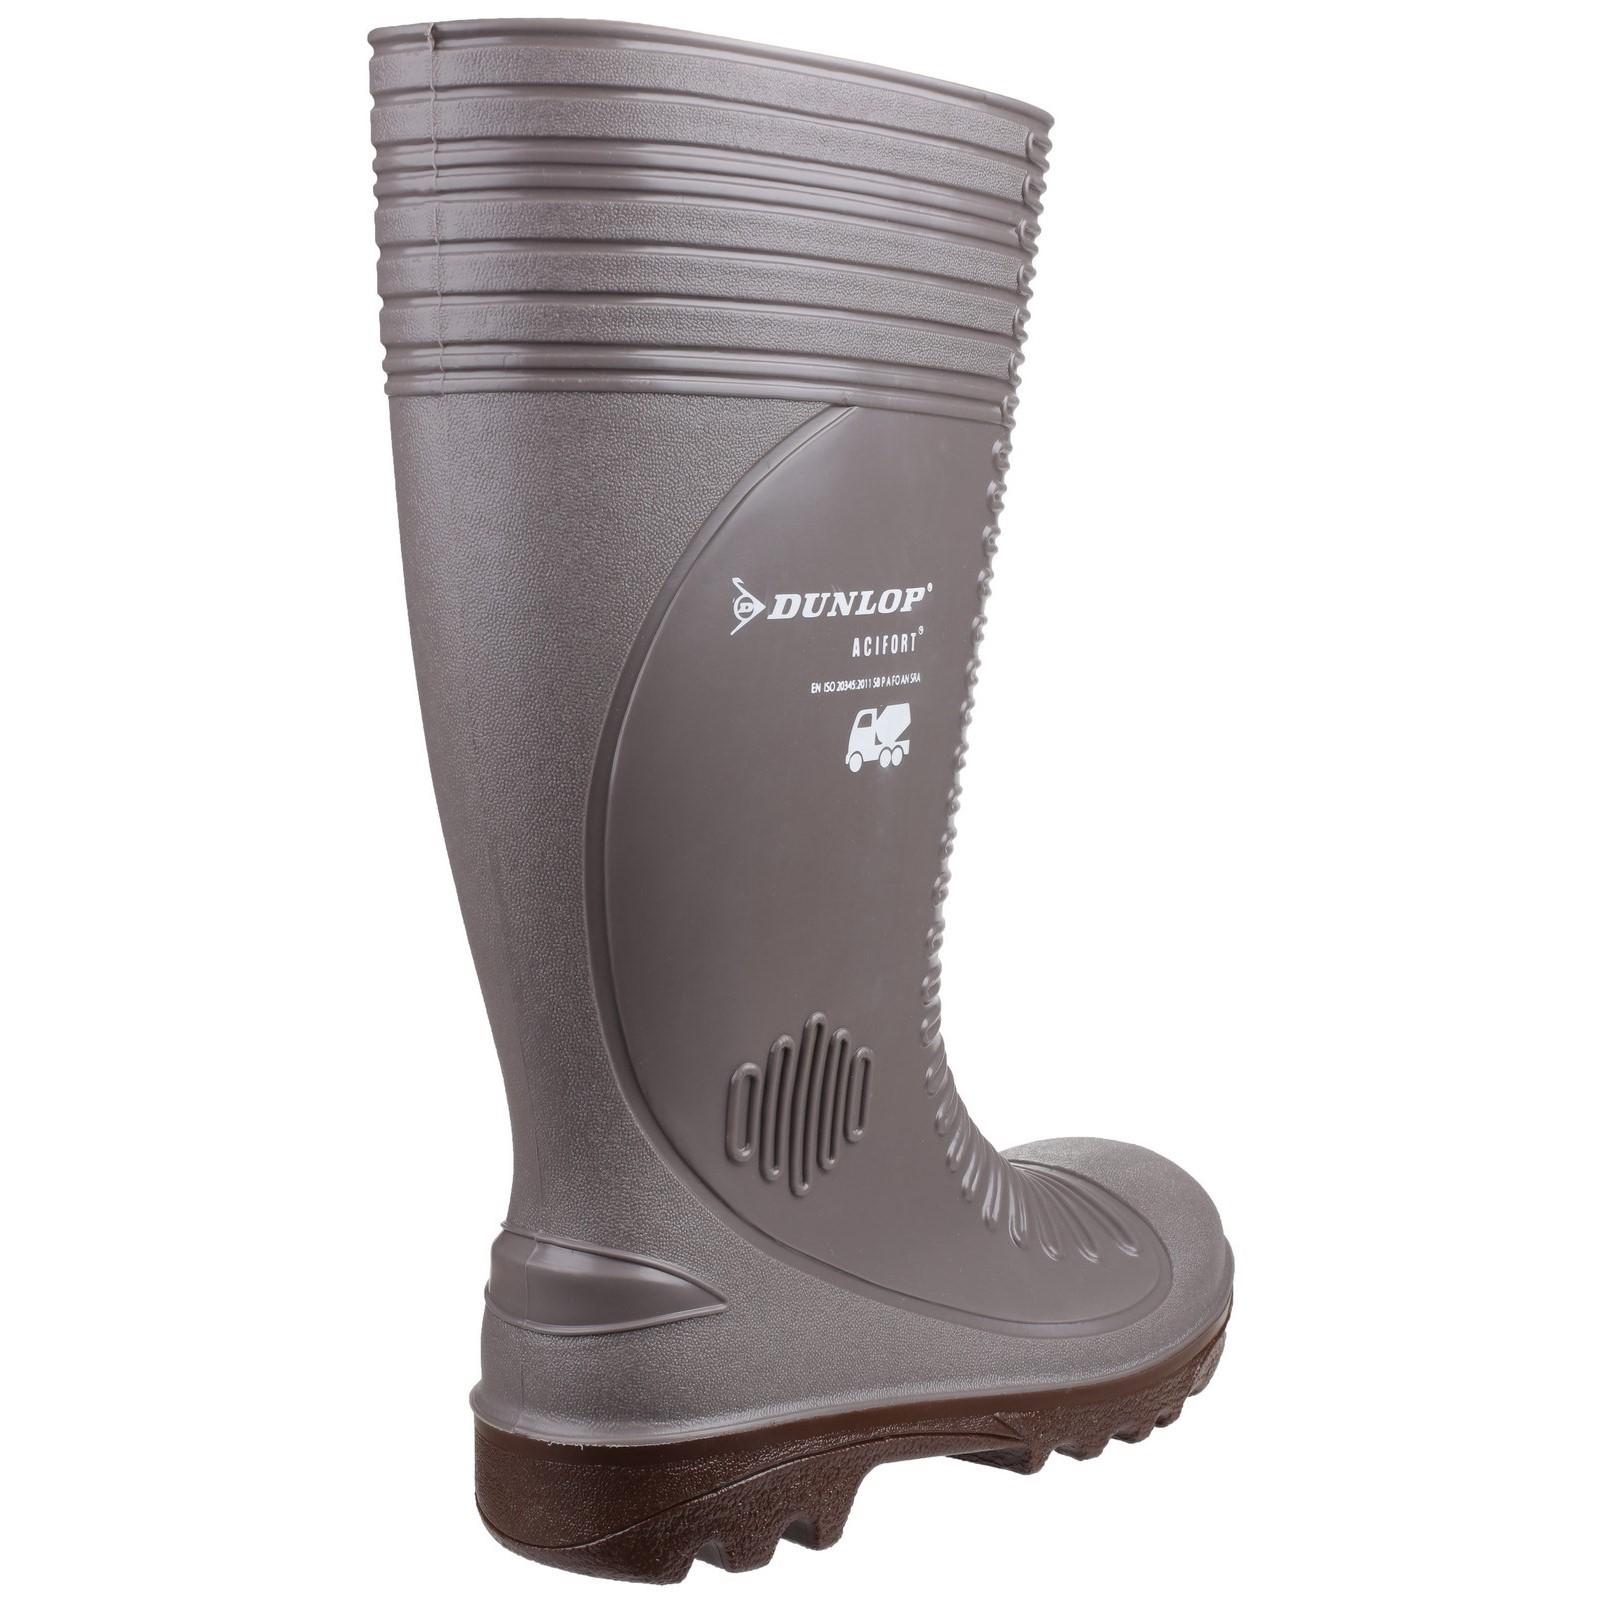 Dunlop Acifort - Bottes imperméables - Homme VBeCpV6u15